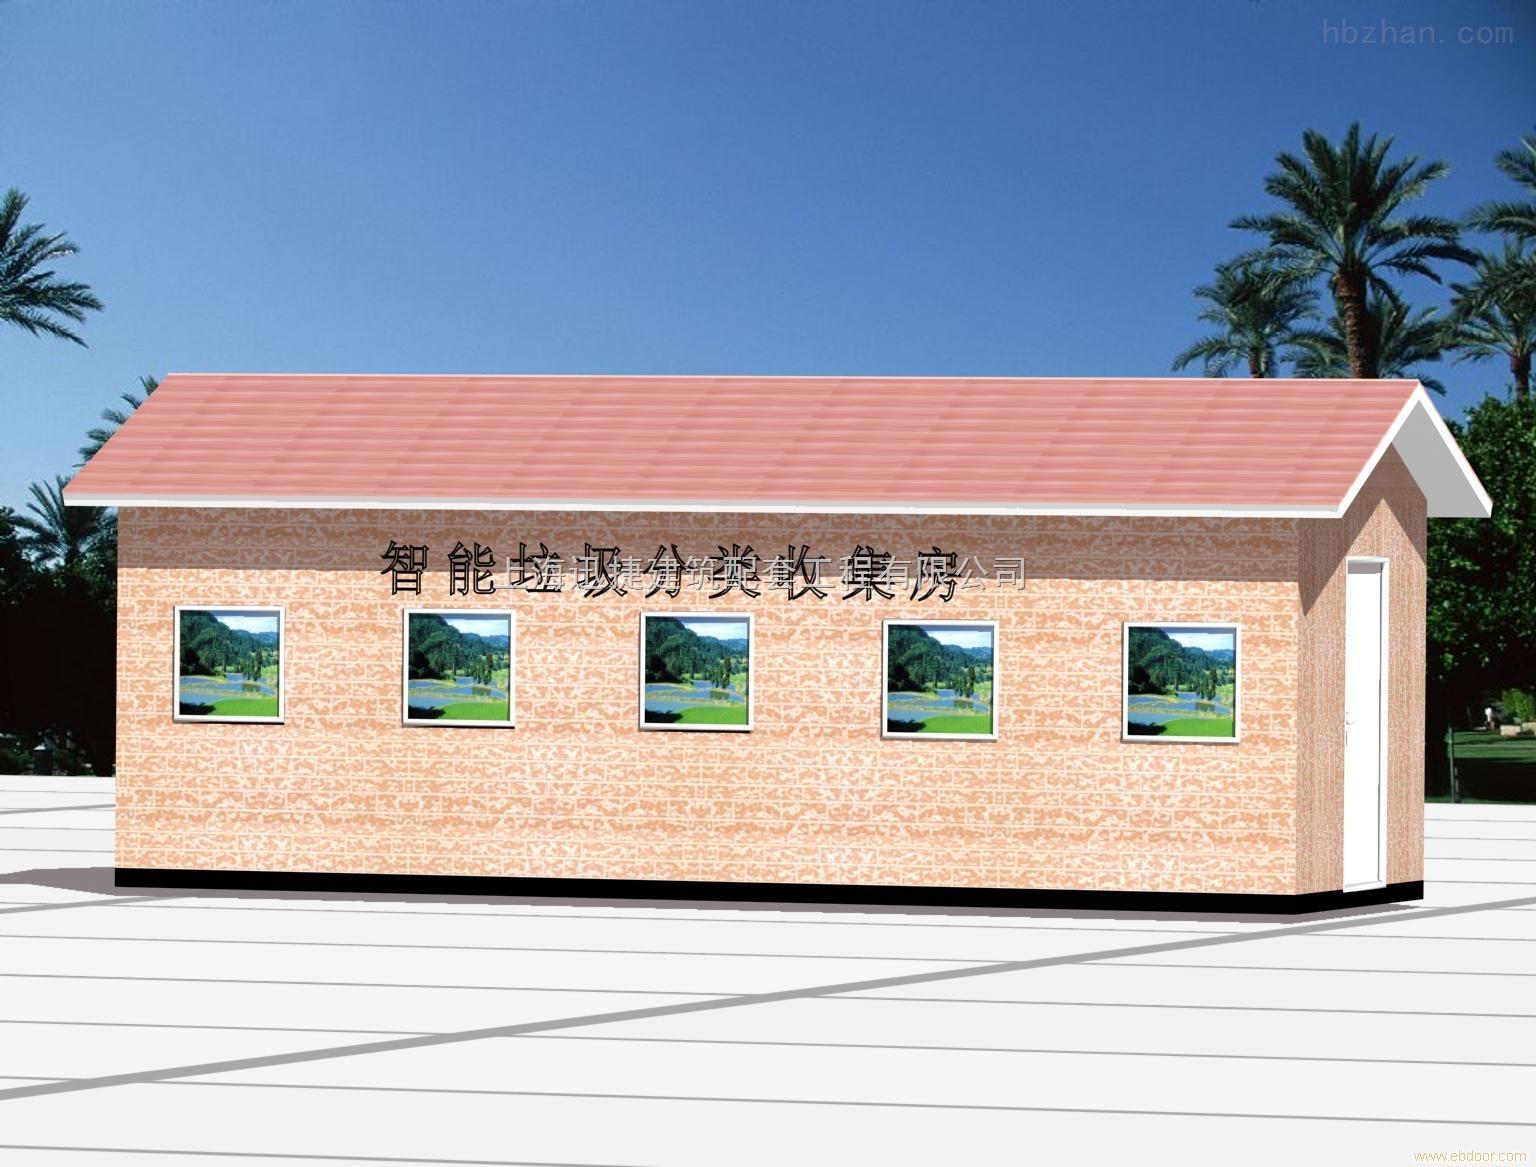 xj-5830-江苏南通大学校园户外环保垃圾房-上海迅捷